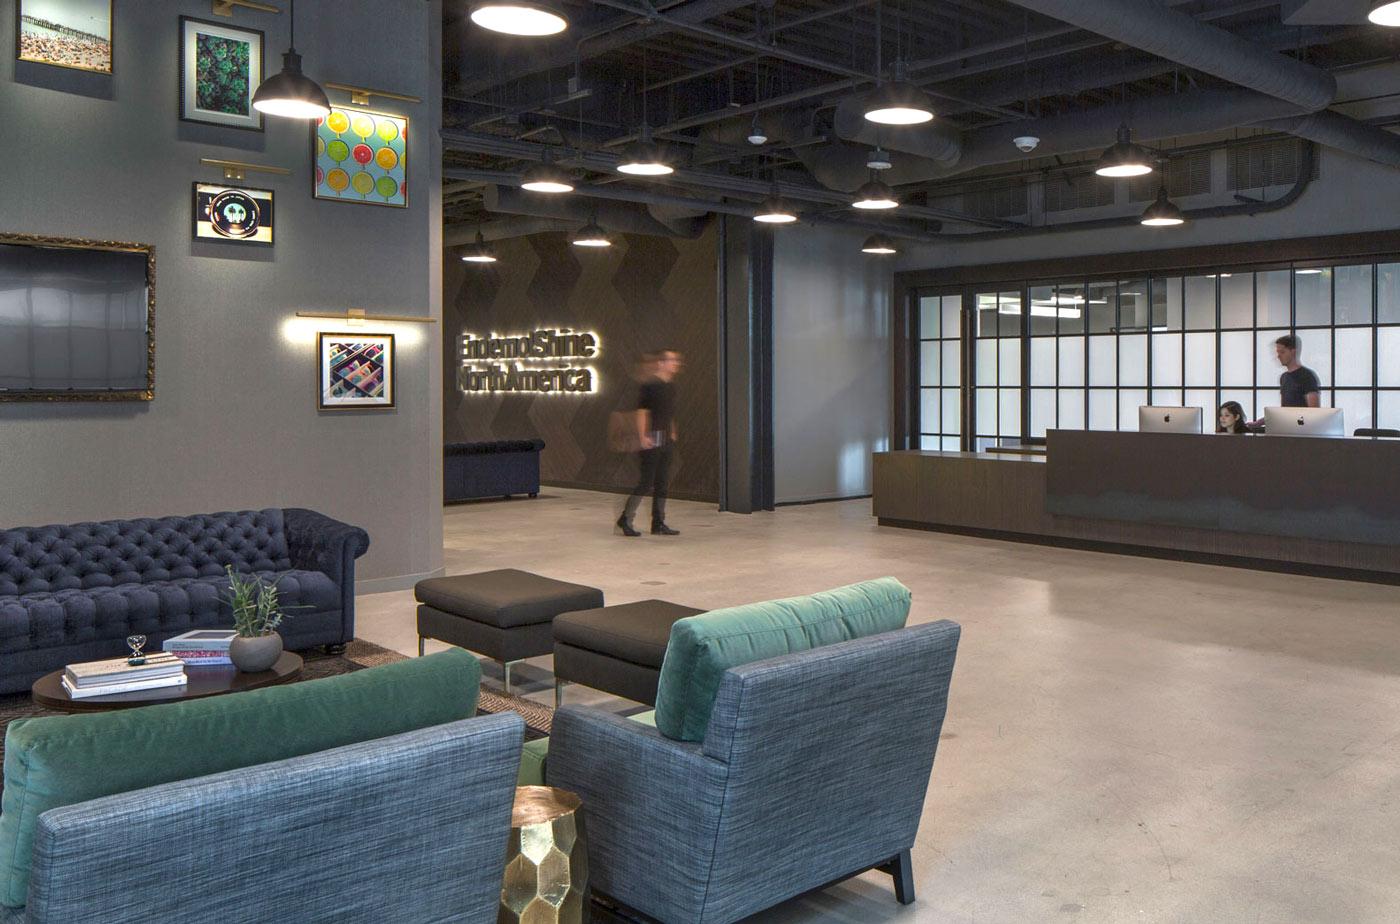 Recimercial office design for Endemol Shine North America